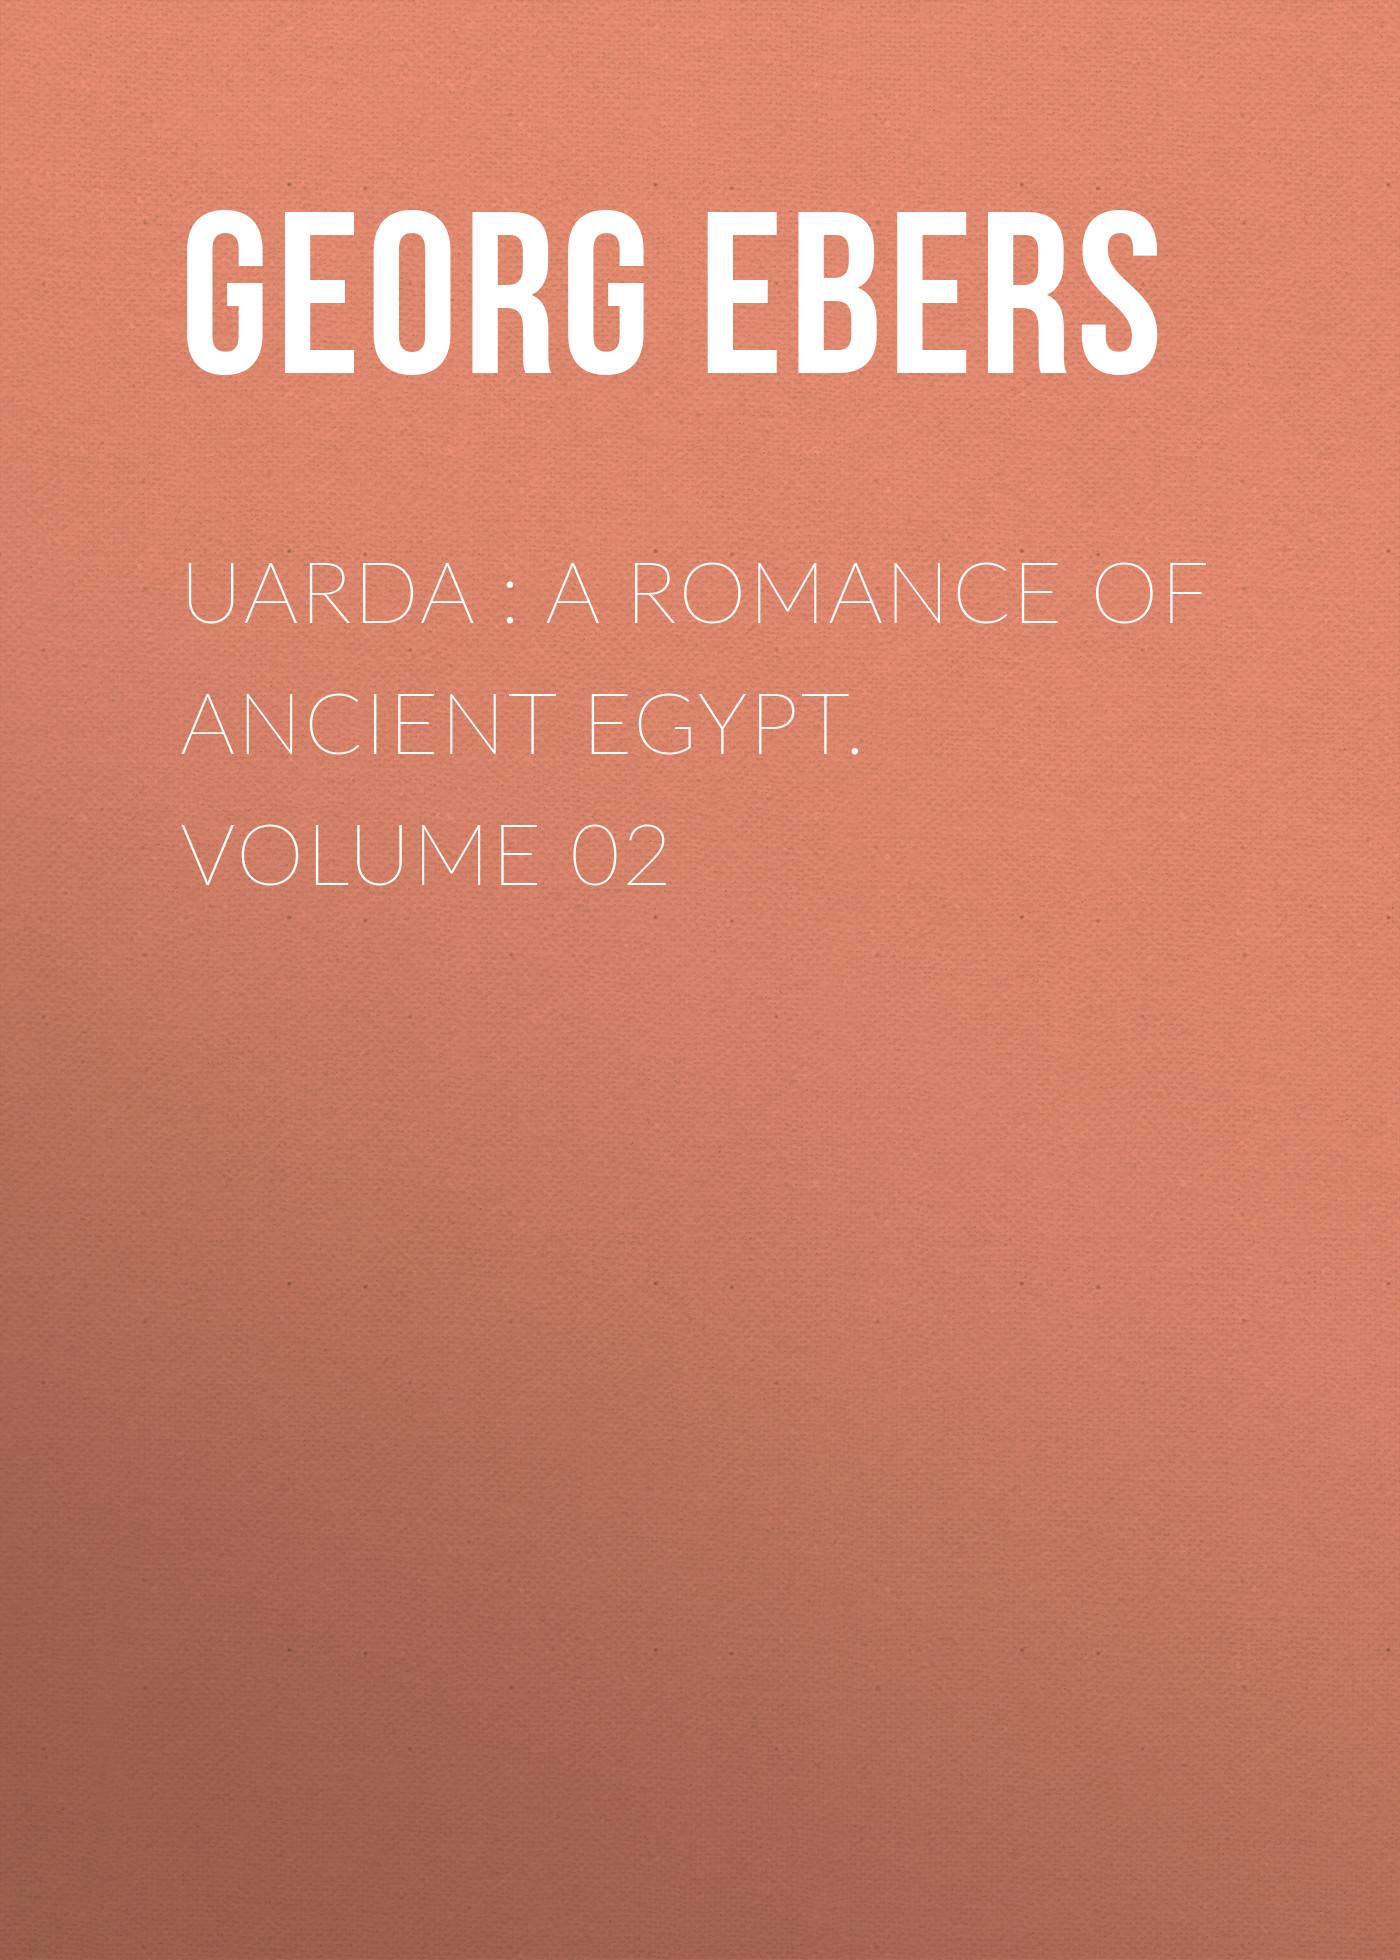 Georg Ebers Uarda : a Romance of Ancient Egypt. Volume 02 ancient egypt